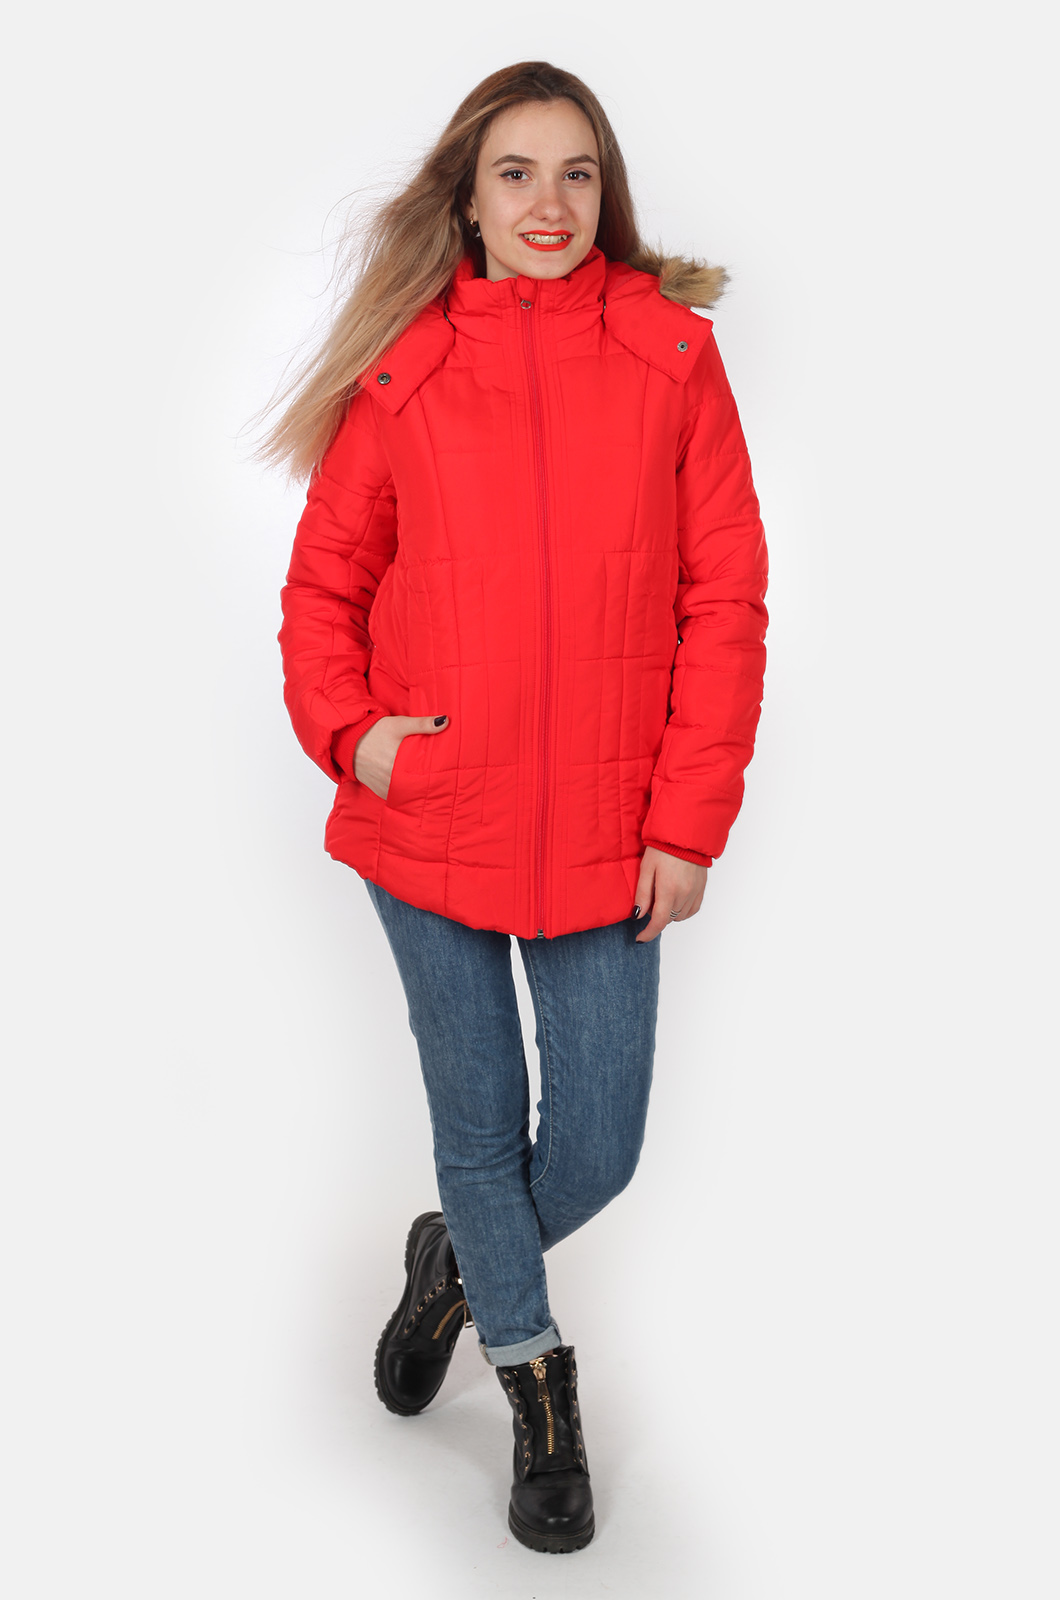 Ярко-красная утепленная куртка для девушек